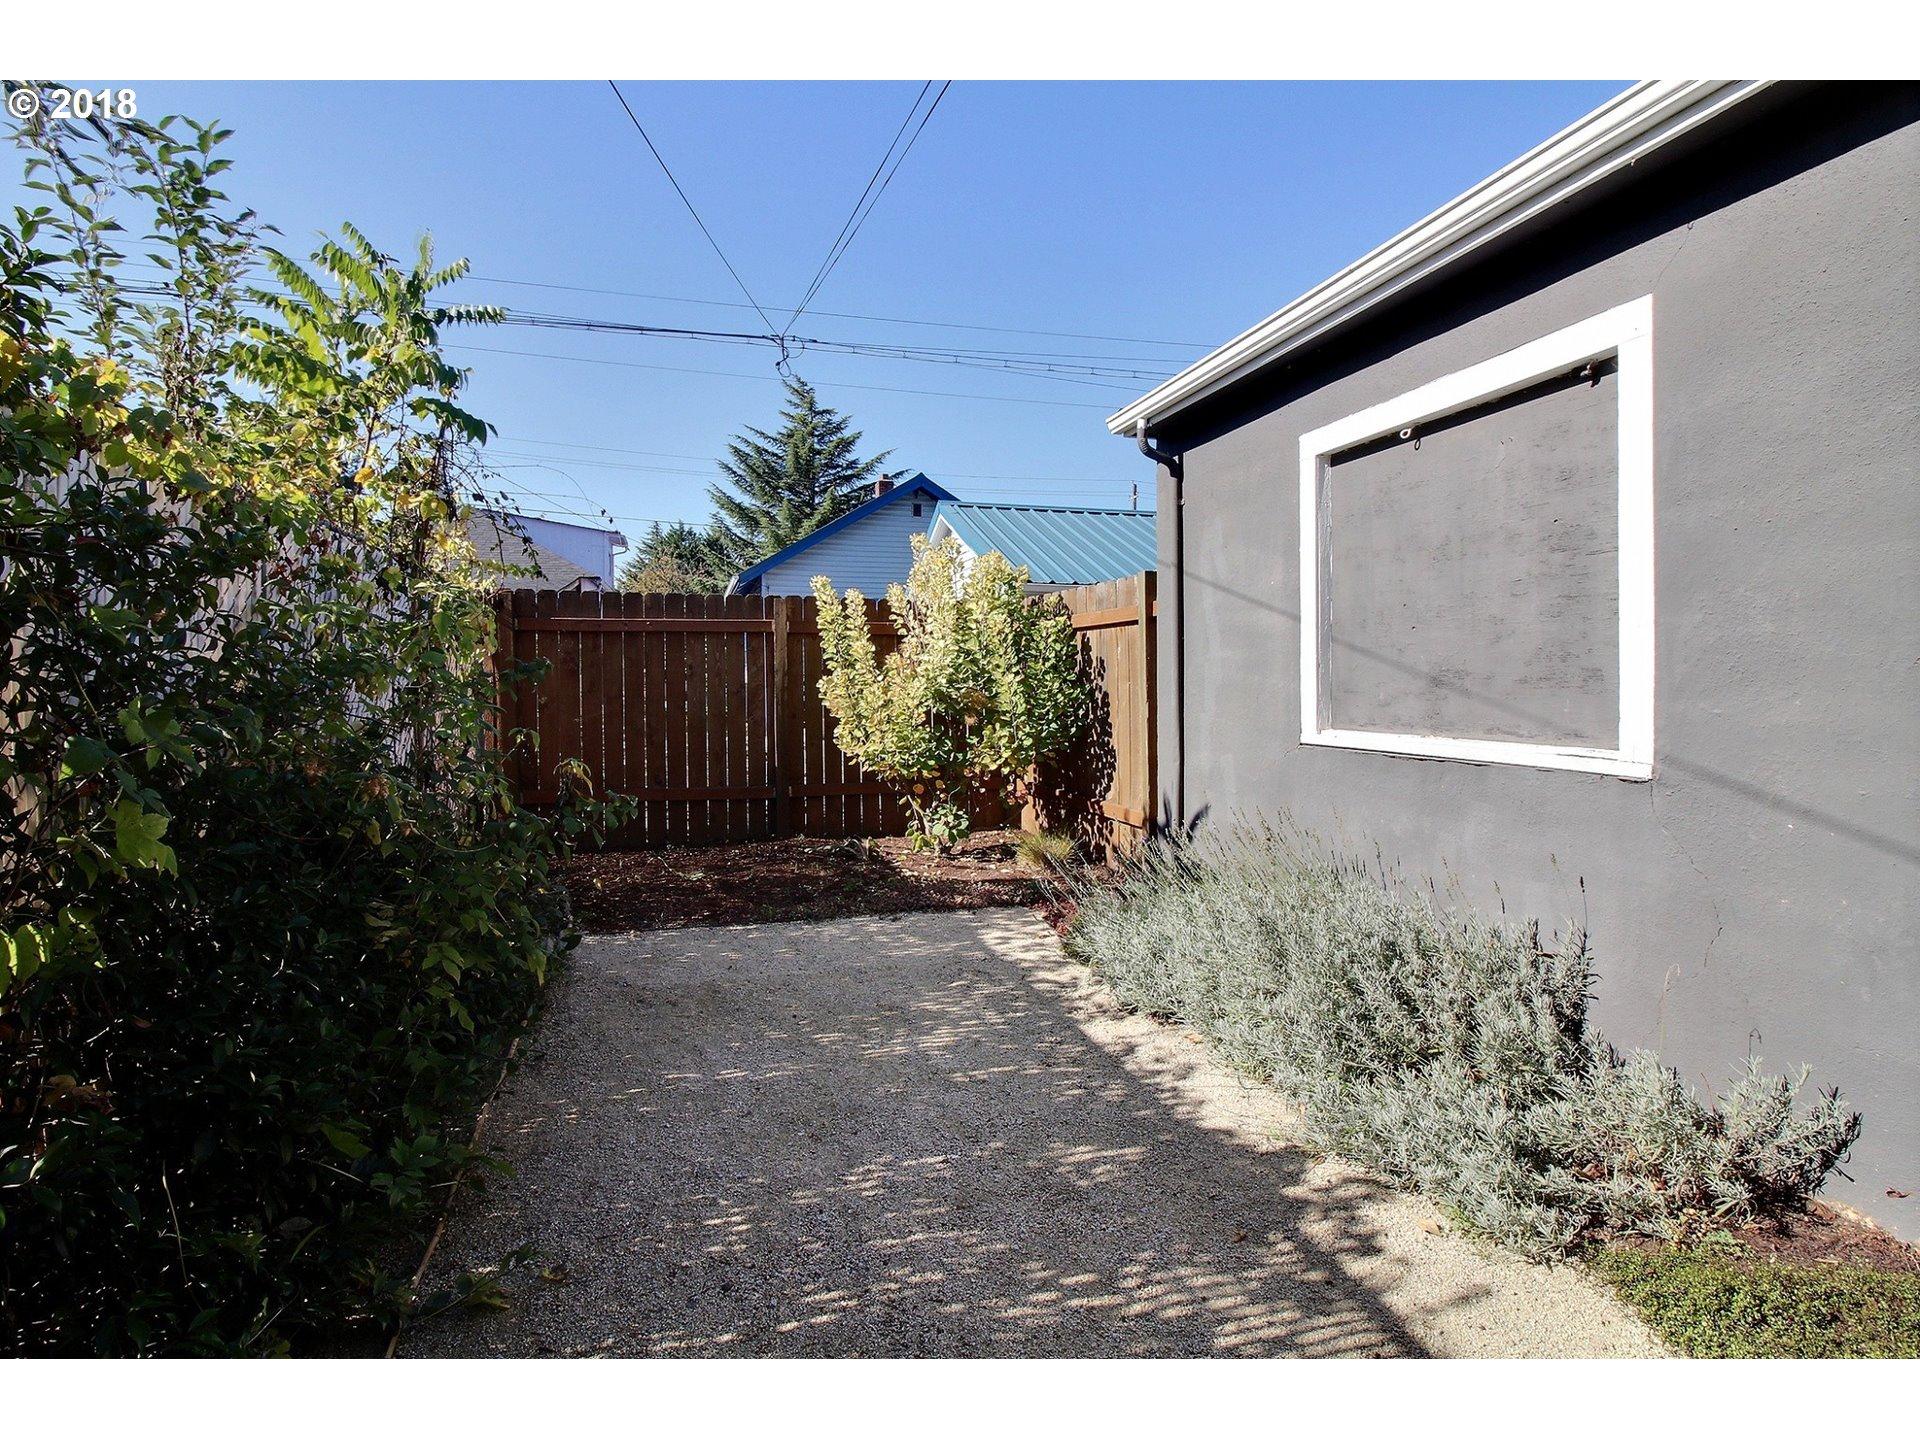 4829 NE 32ND AVE Portland, OR 97211 - MLS #: 18609731